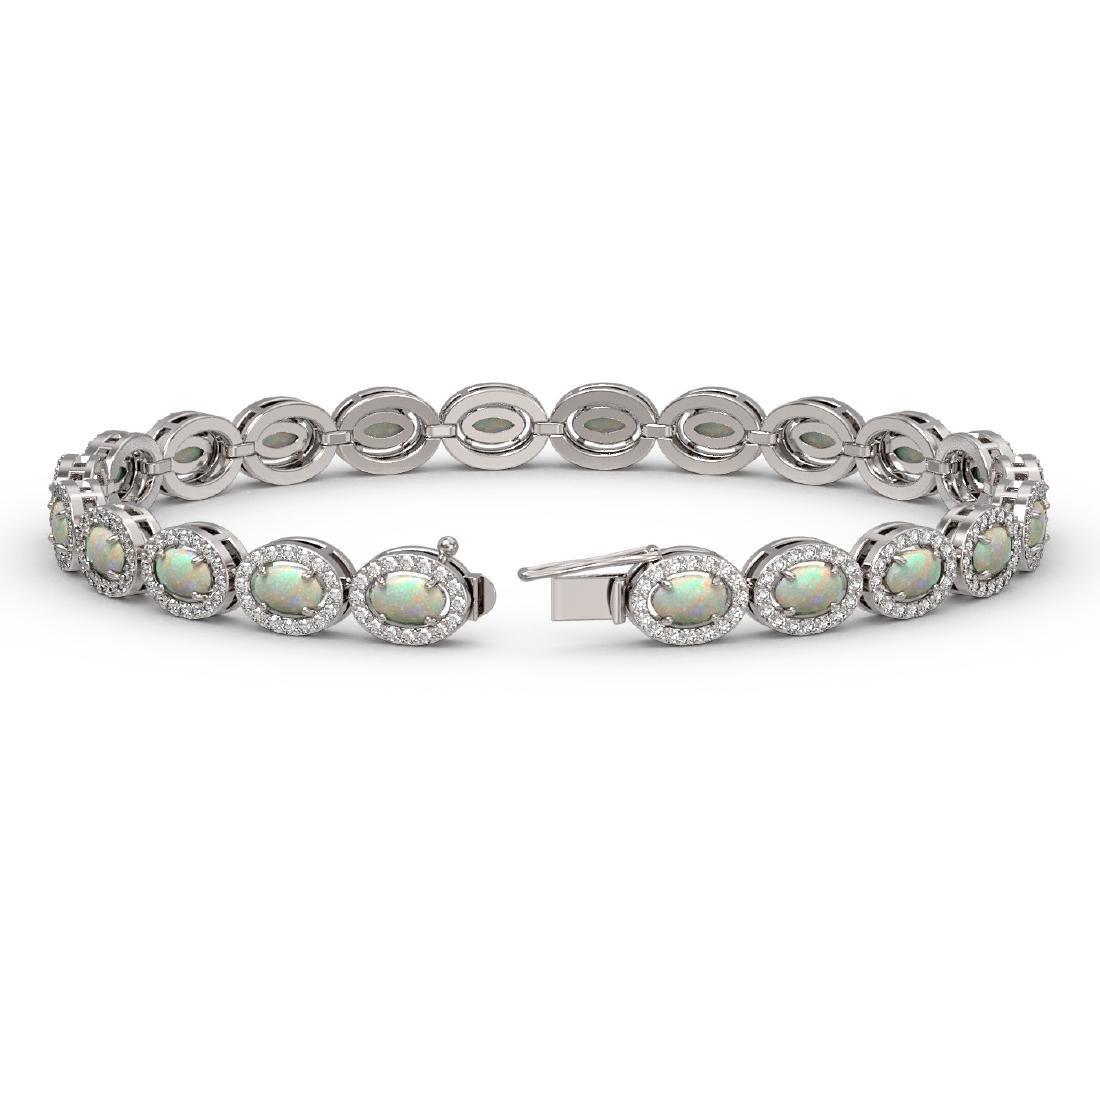 8.28 CTW Opal & Diamond Halo Bracelet 10K White Gold - 2